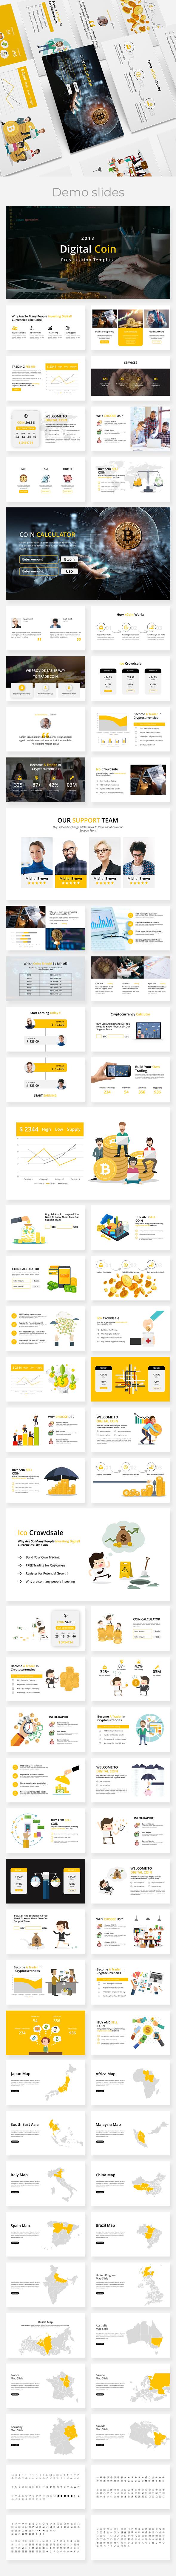 Digital Coin - Business Keynote Presentation - Business Keynote Templates